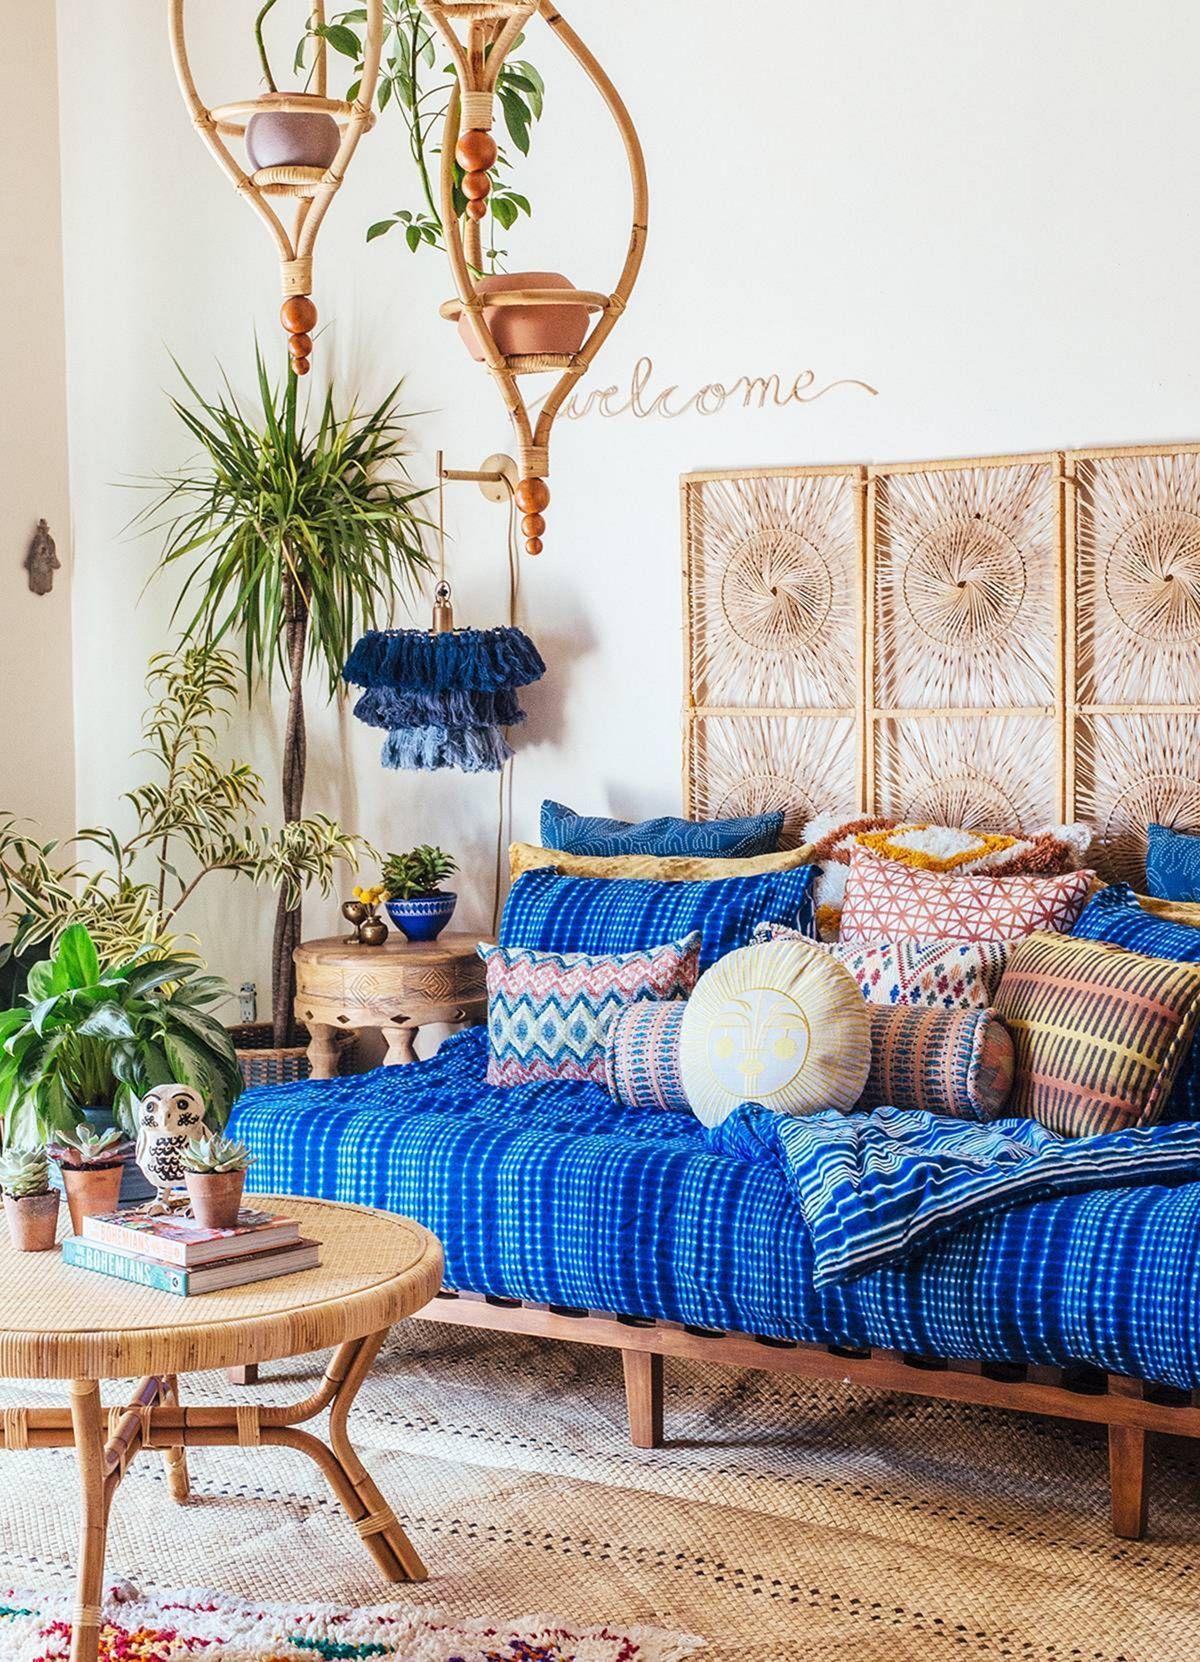 25 Fantastic Bohemian Living Room Decoration Ideas For You Make Inspiration Hippie Living Room Bohemian Living Rooms Boho Living Room